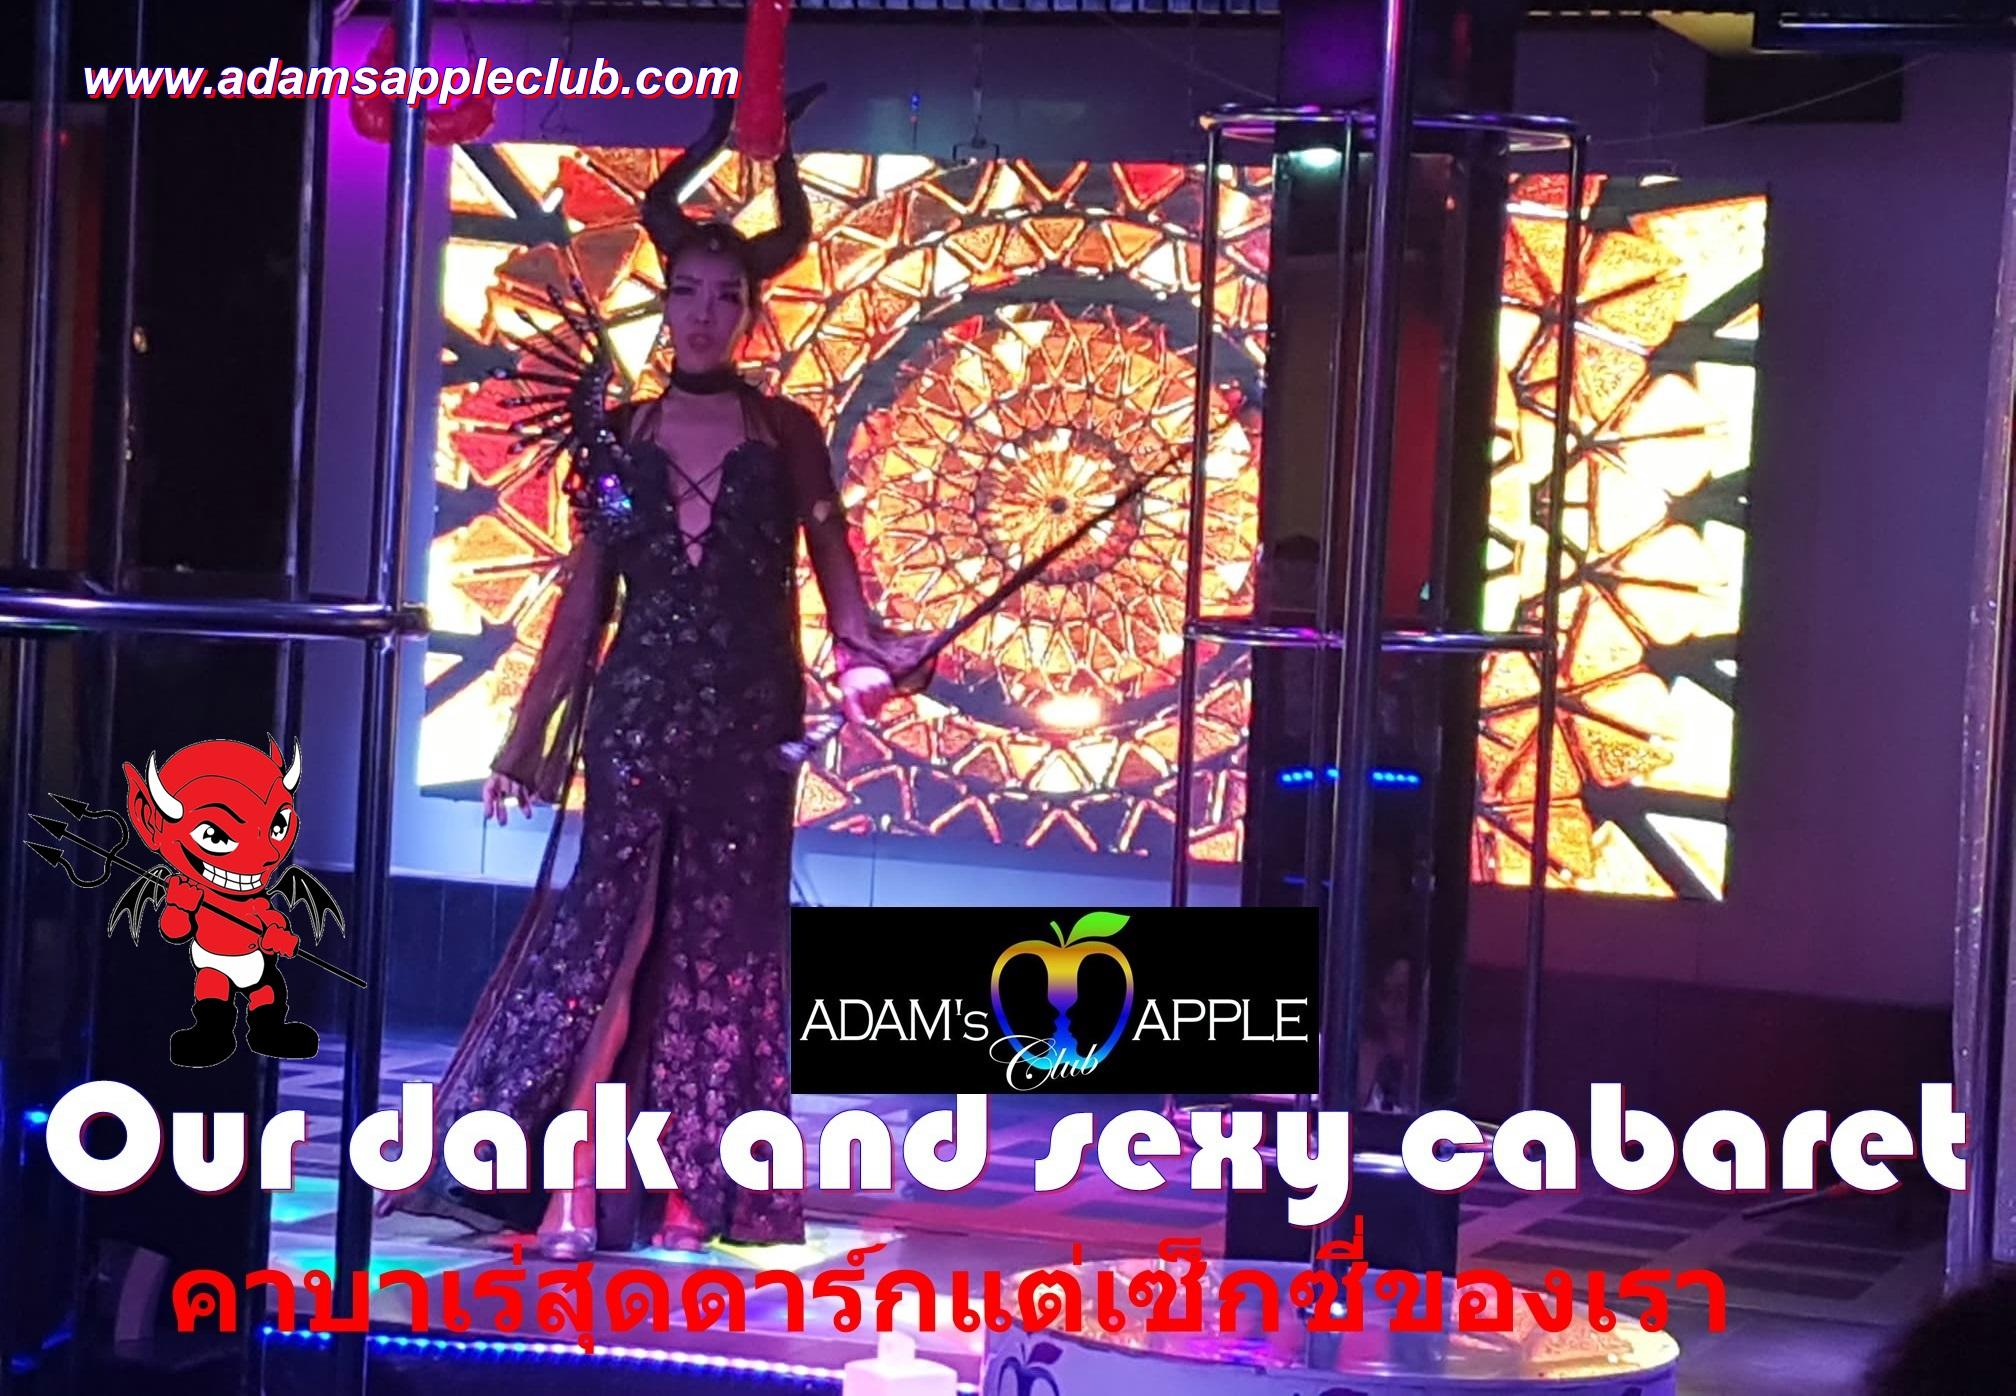 Our dark and sexy cabaret Adams Apple Club